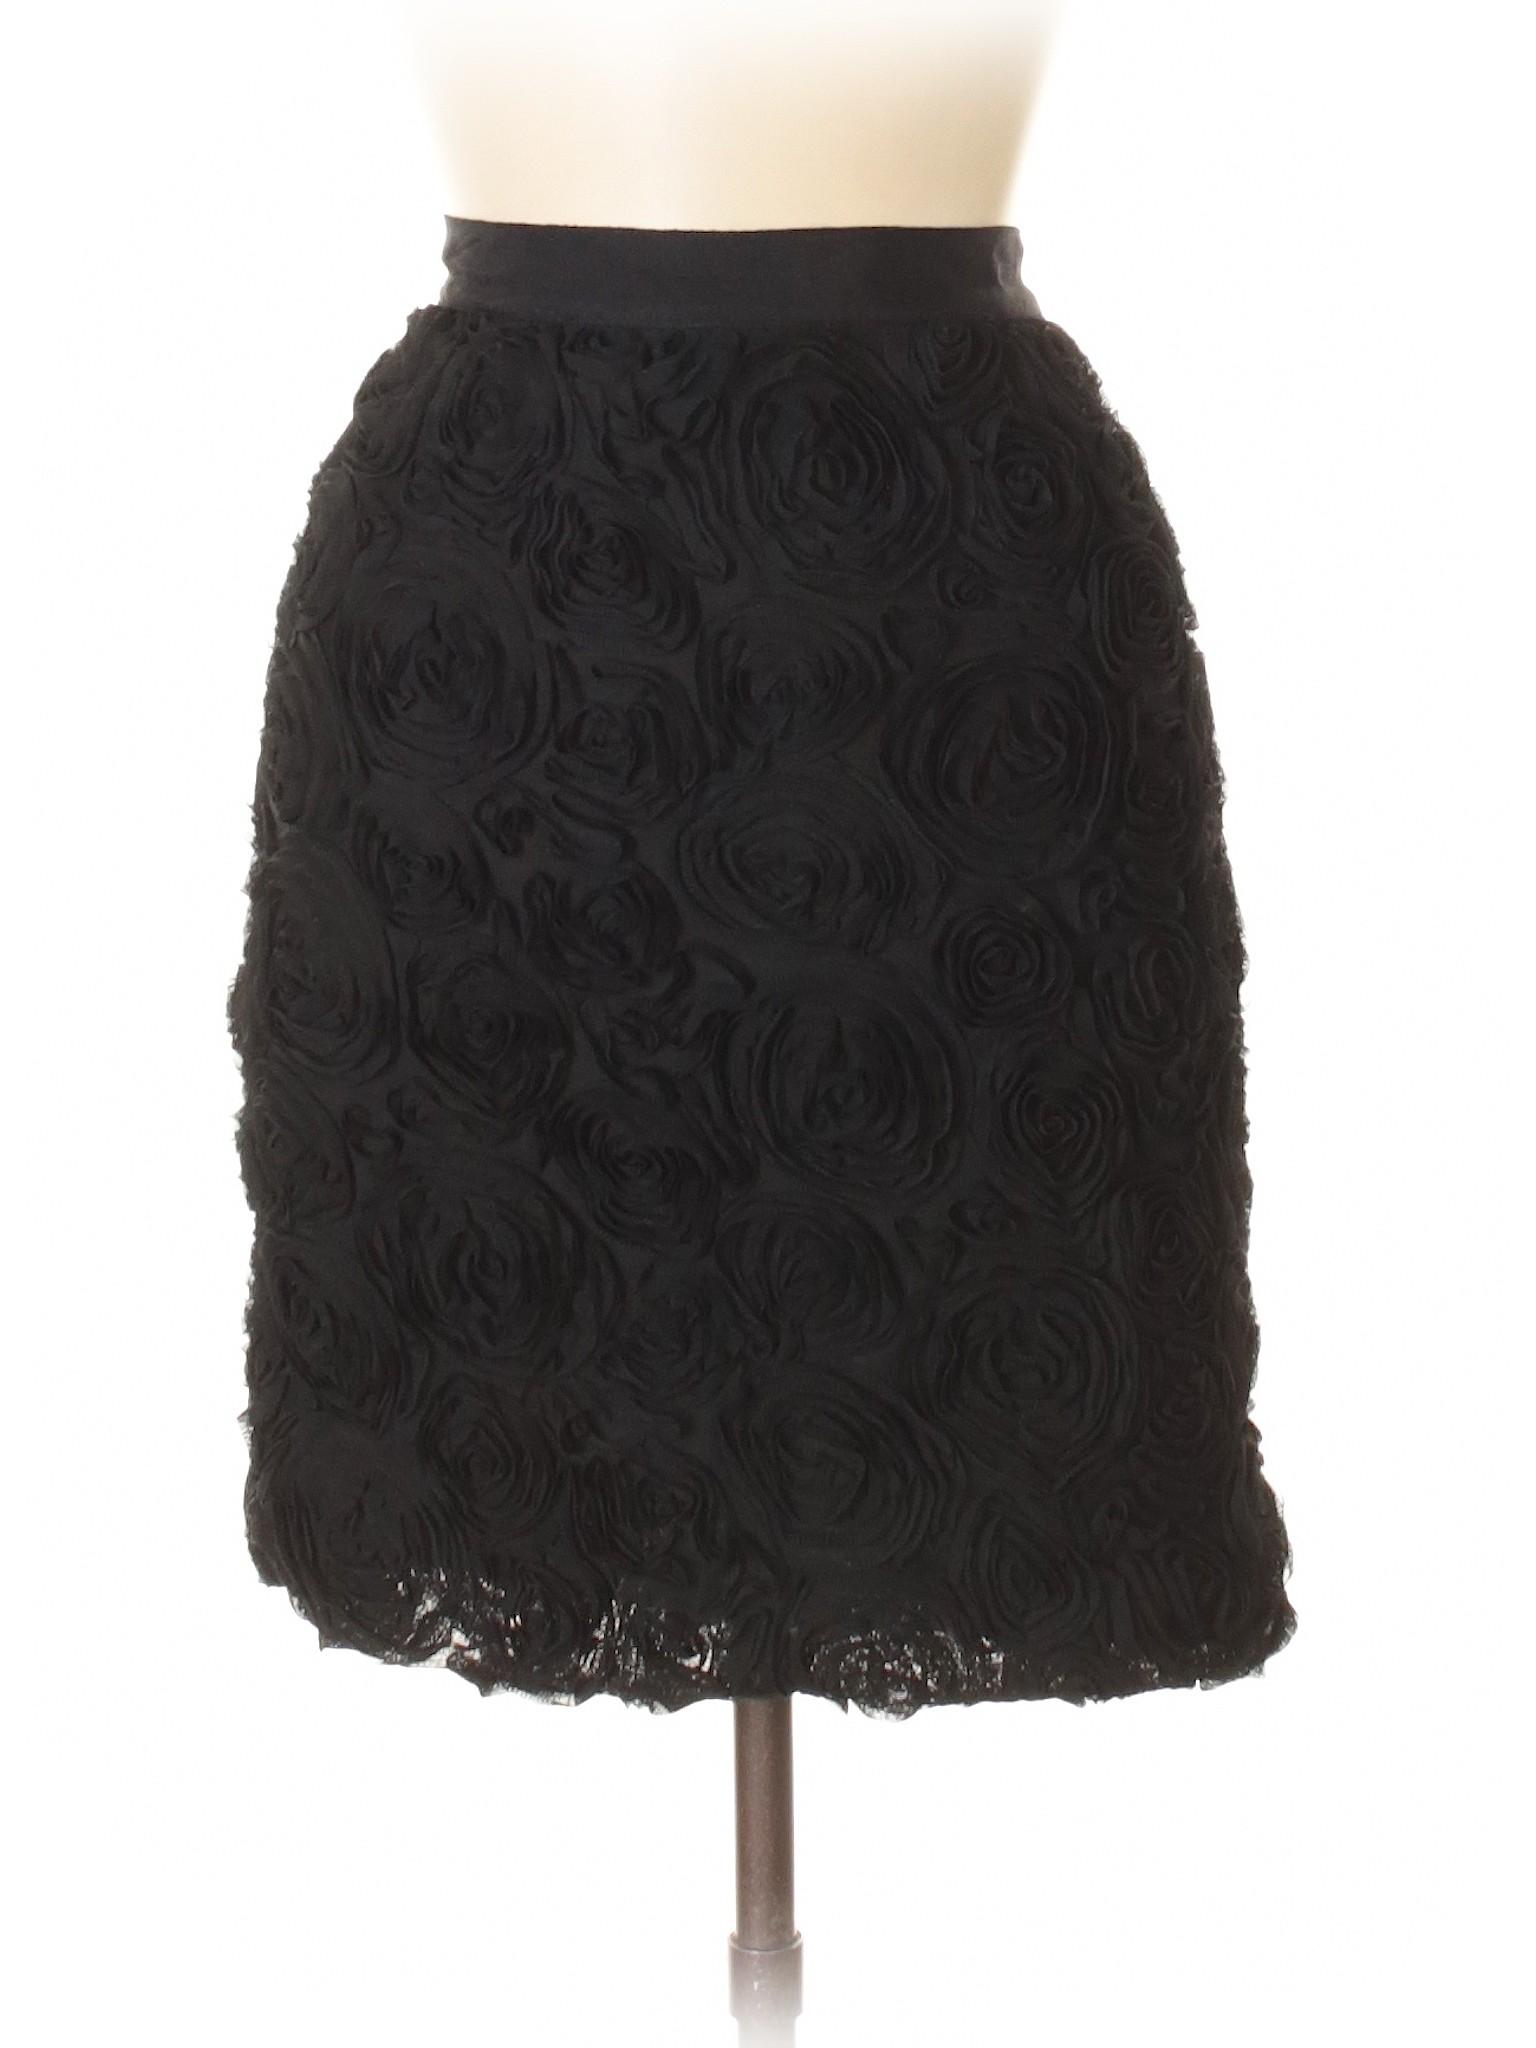 Skirt Republic Leisure Banana Casual Boutique UpTqIFRxww